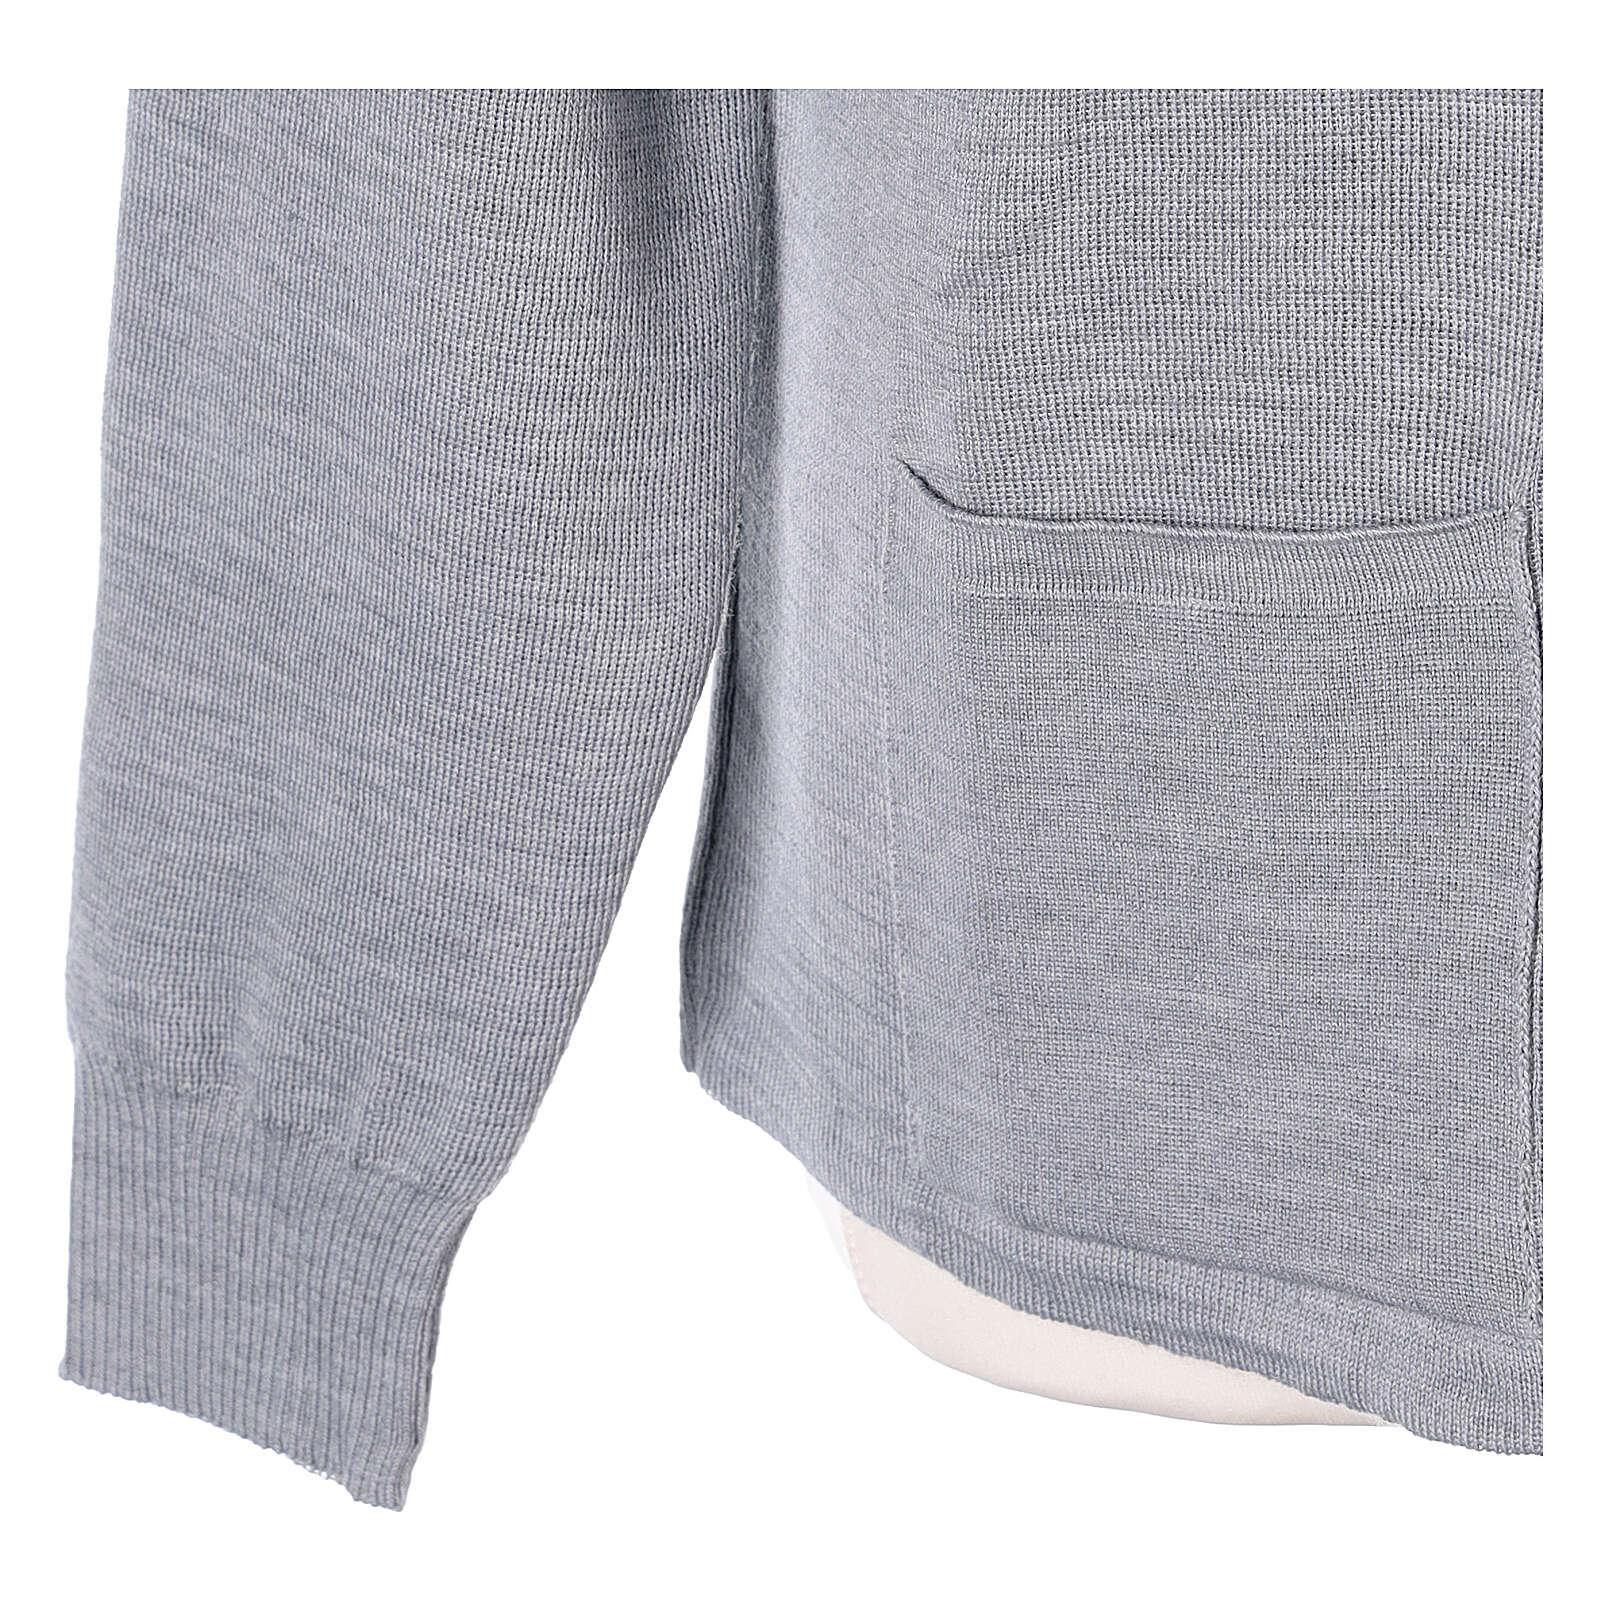 Chaqueta coreana con cremallera 50% acrílico 50% lana merina gris perla monja In Primis 4